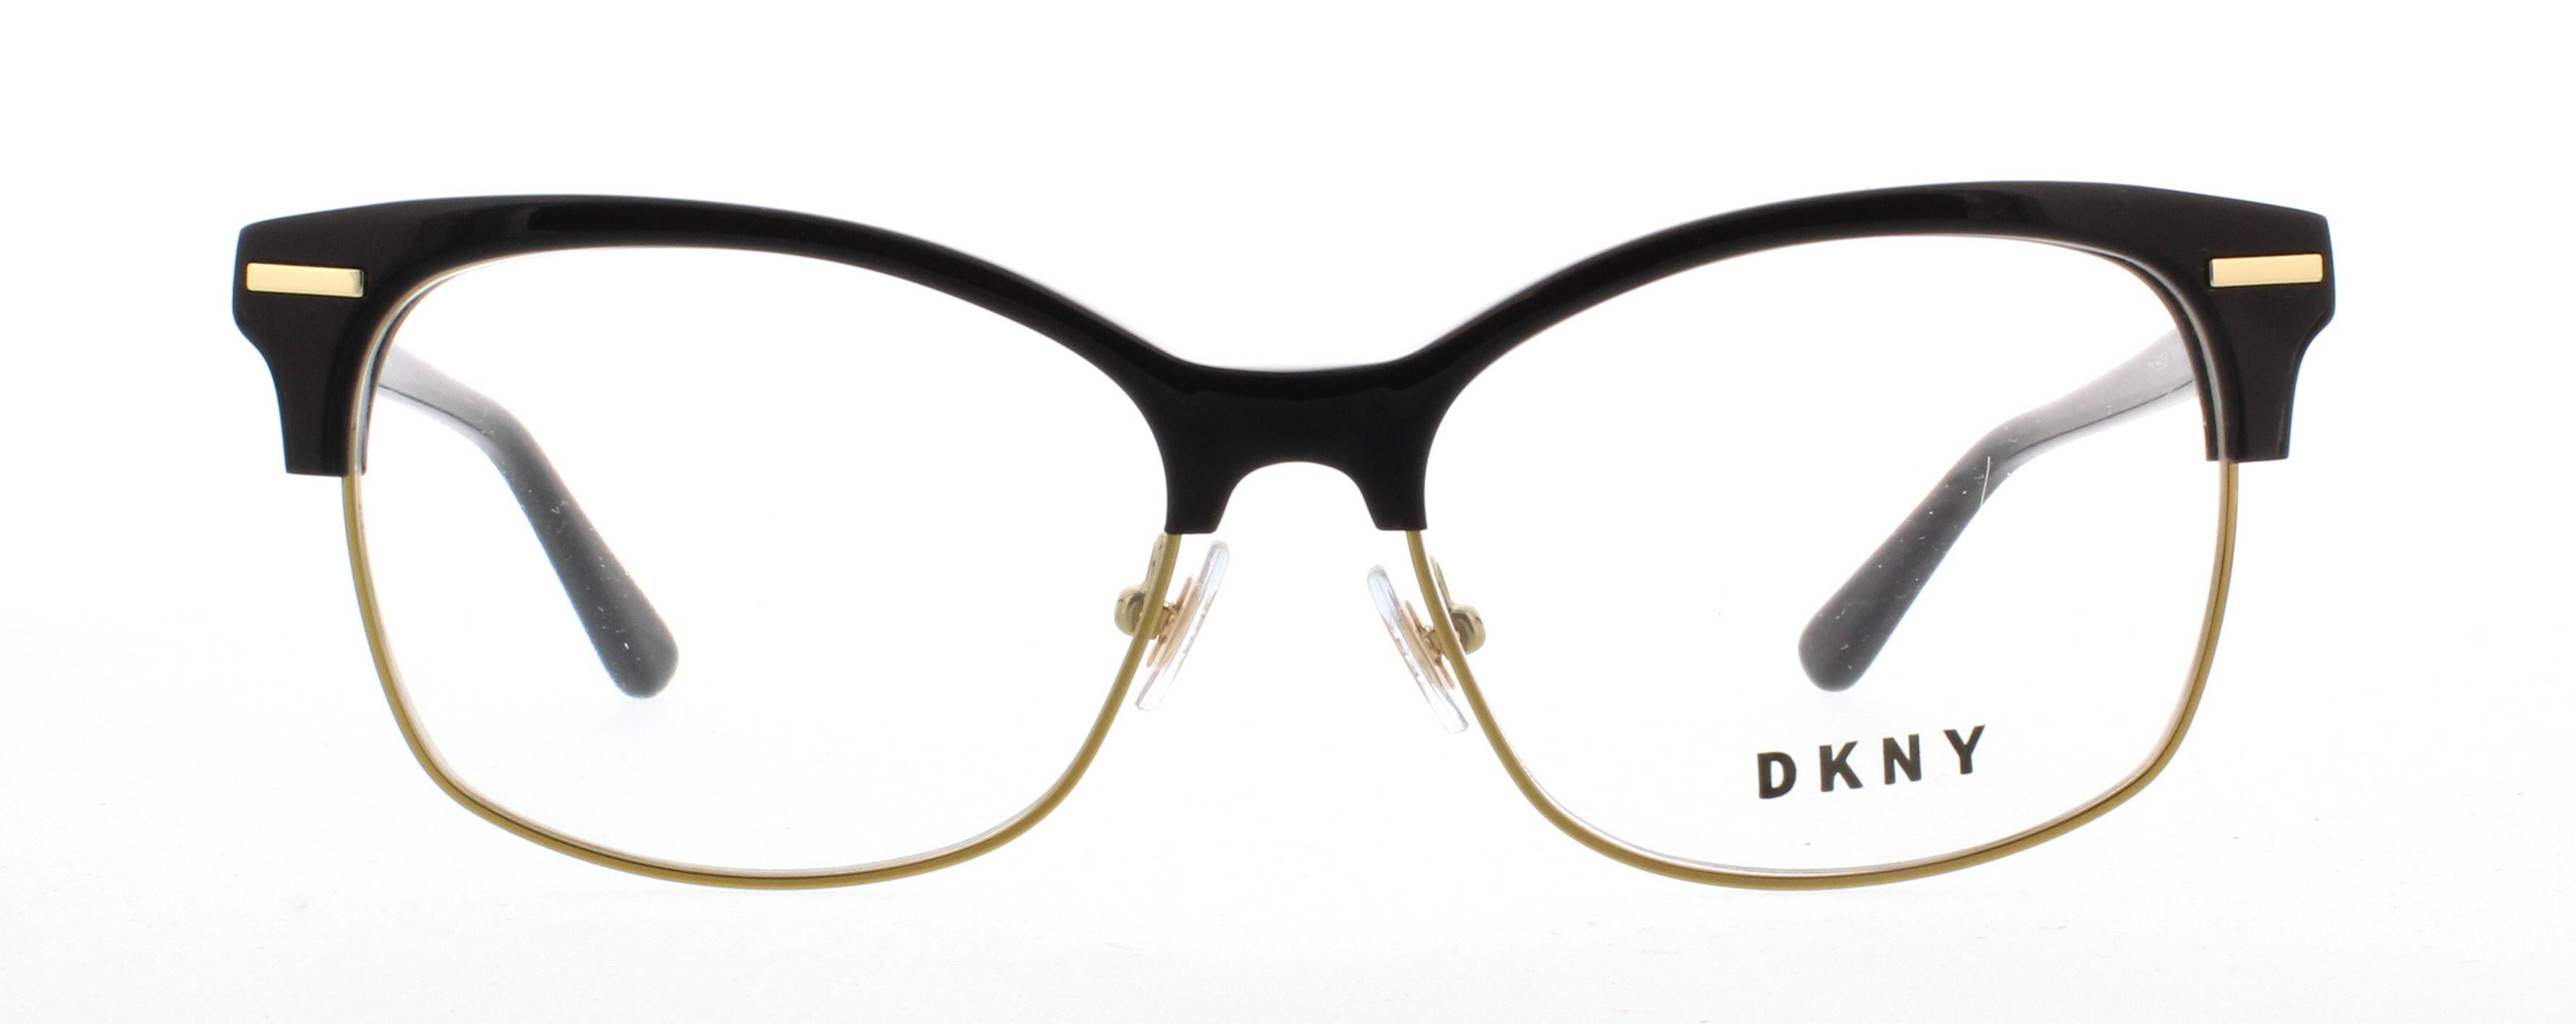 Unique Dkny Glass Frames Gallery - Framed Art Ideas - roadofriches.com